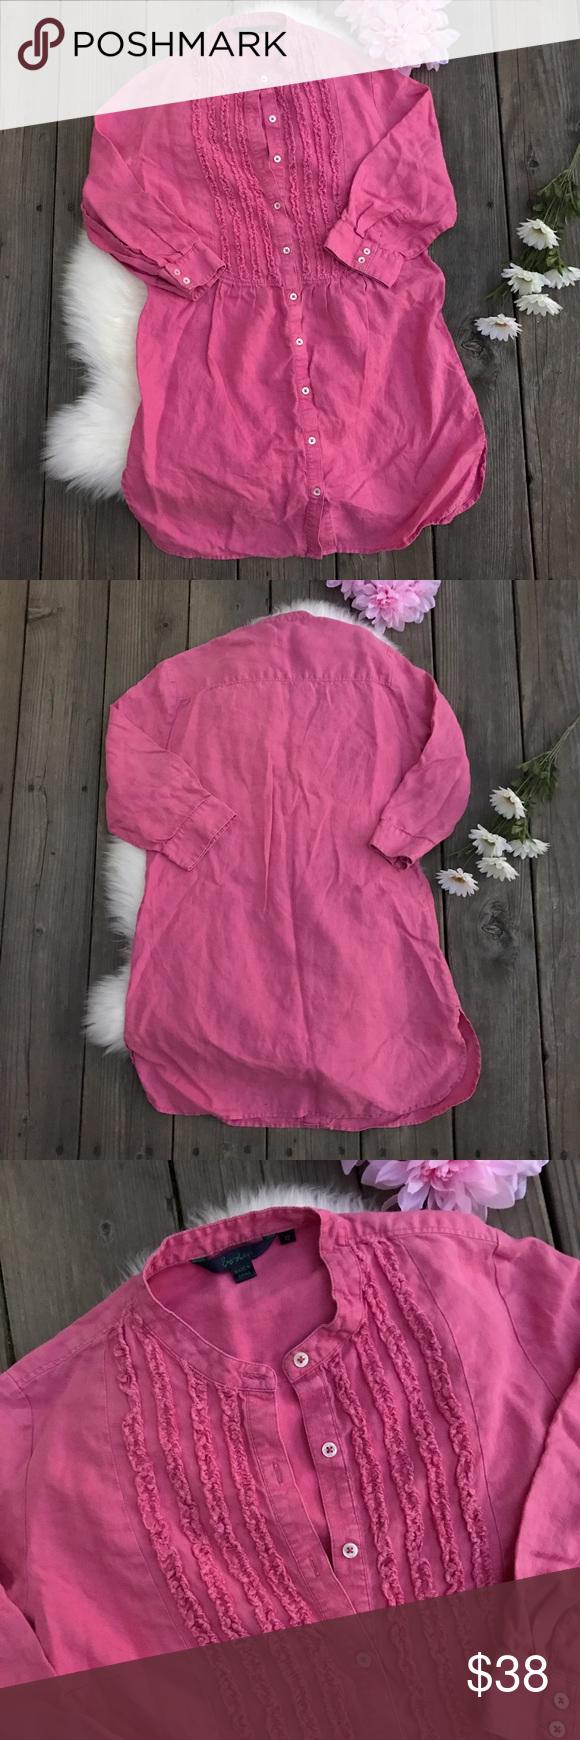 Boden Ruffle💕Tunic Dress! Sz 12 Boden Ruffle Tunic Dress! Boden Dresses Mini